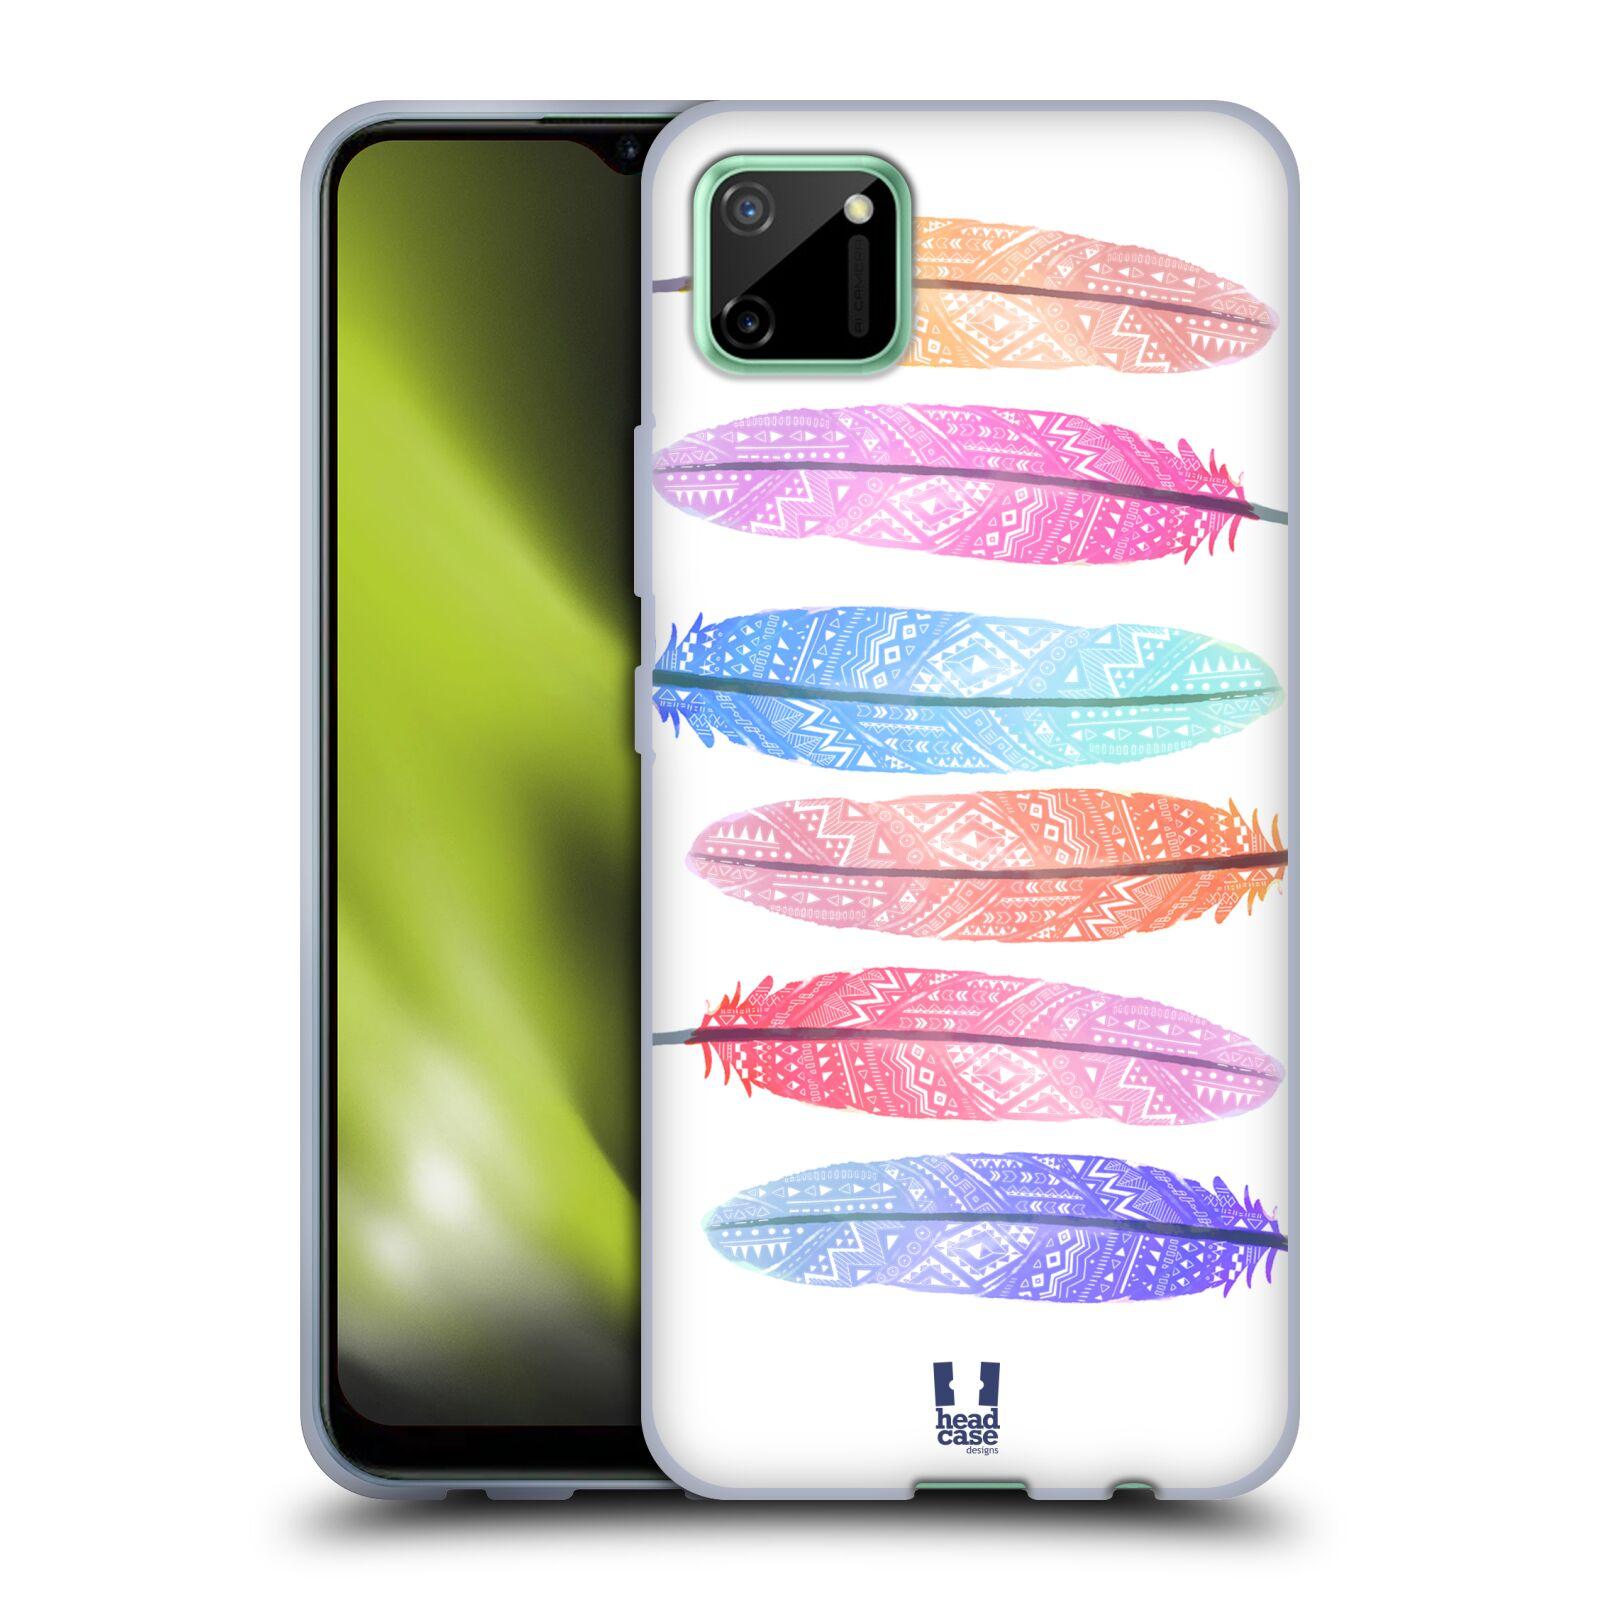 Silikonové pouzdro na mobil Realme C11 - Head Case - AZTEC PÍRKA SILUETY